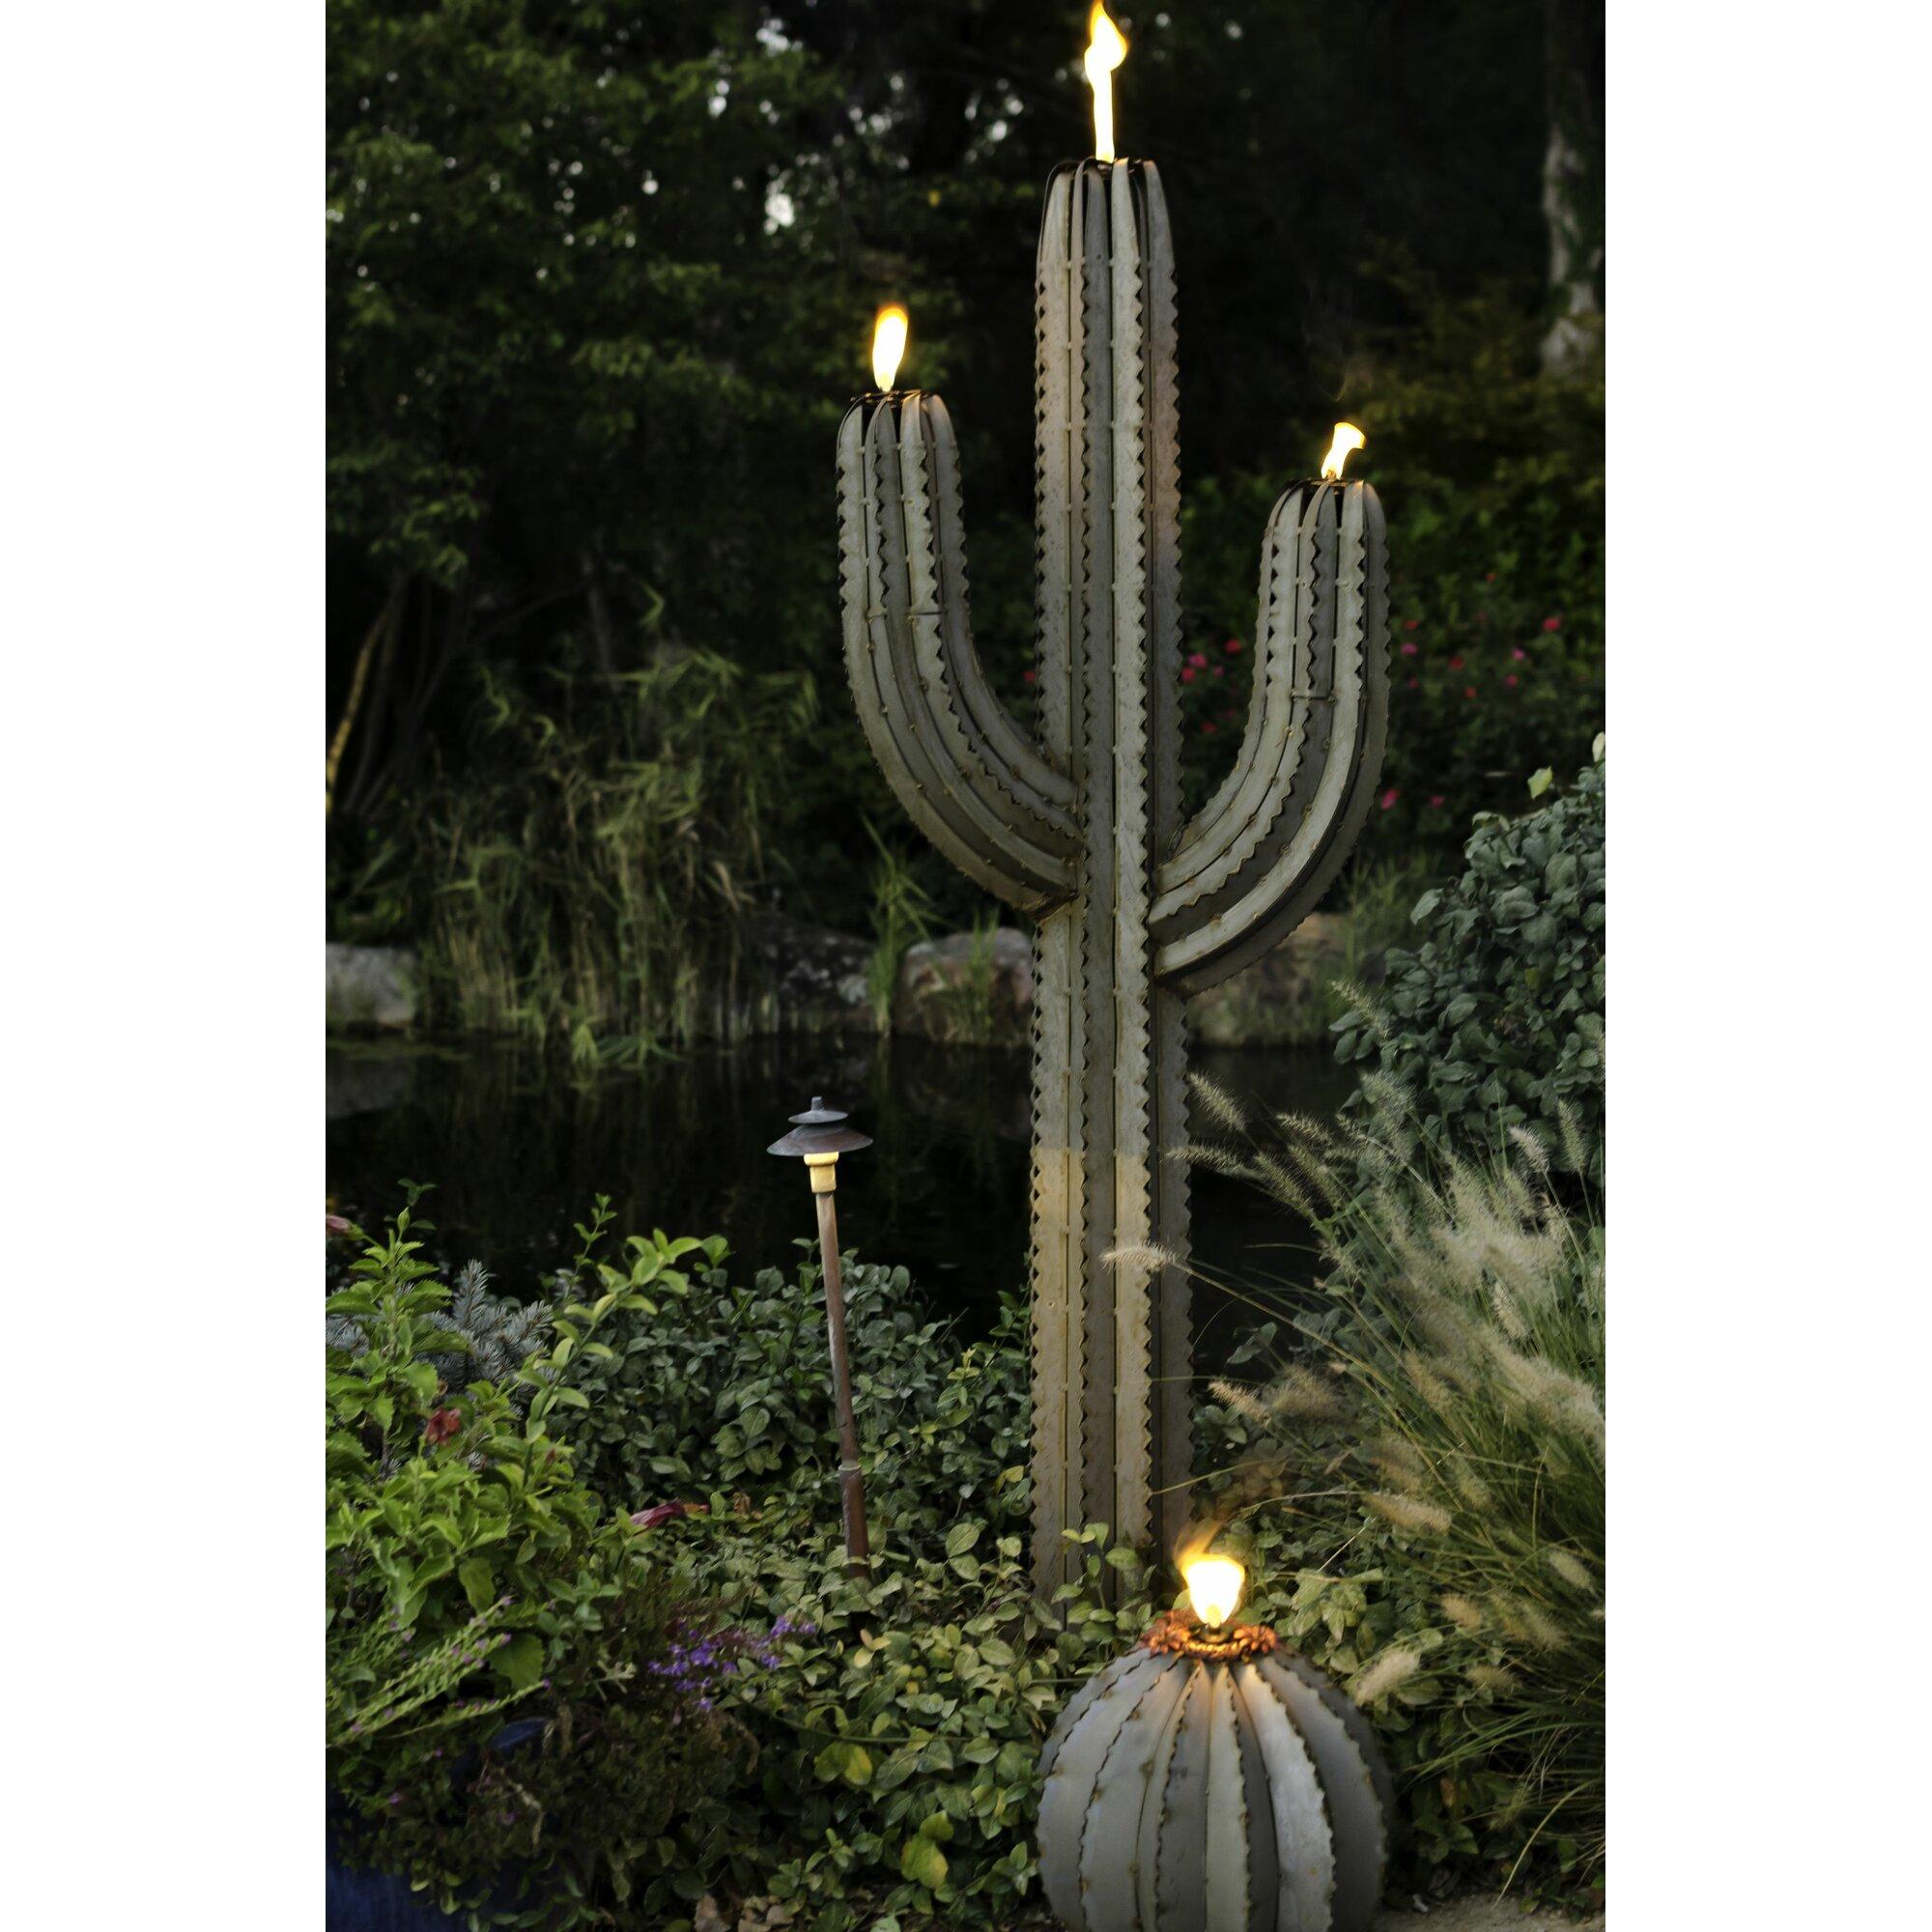 Desert Steel Saguaro Cactus Garden Torch Amp Reviews